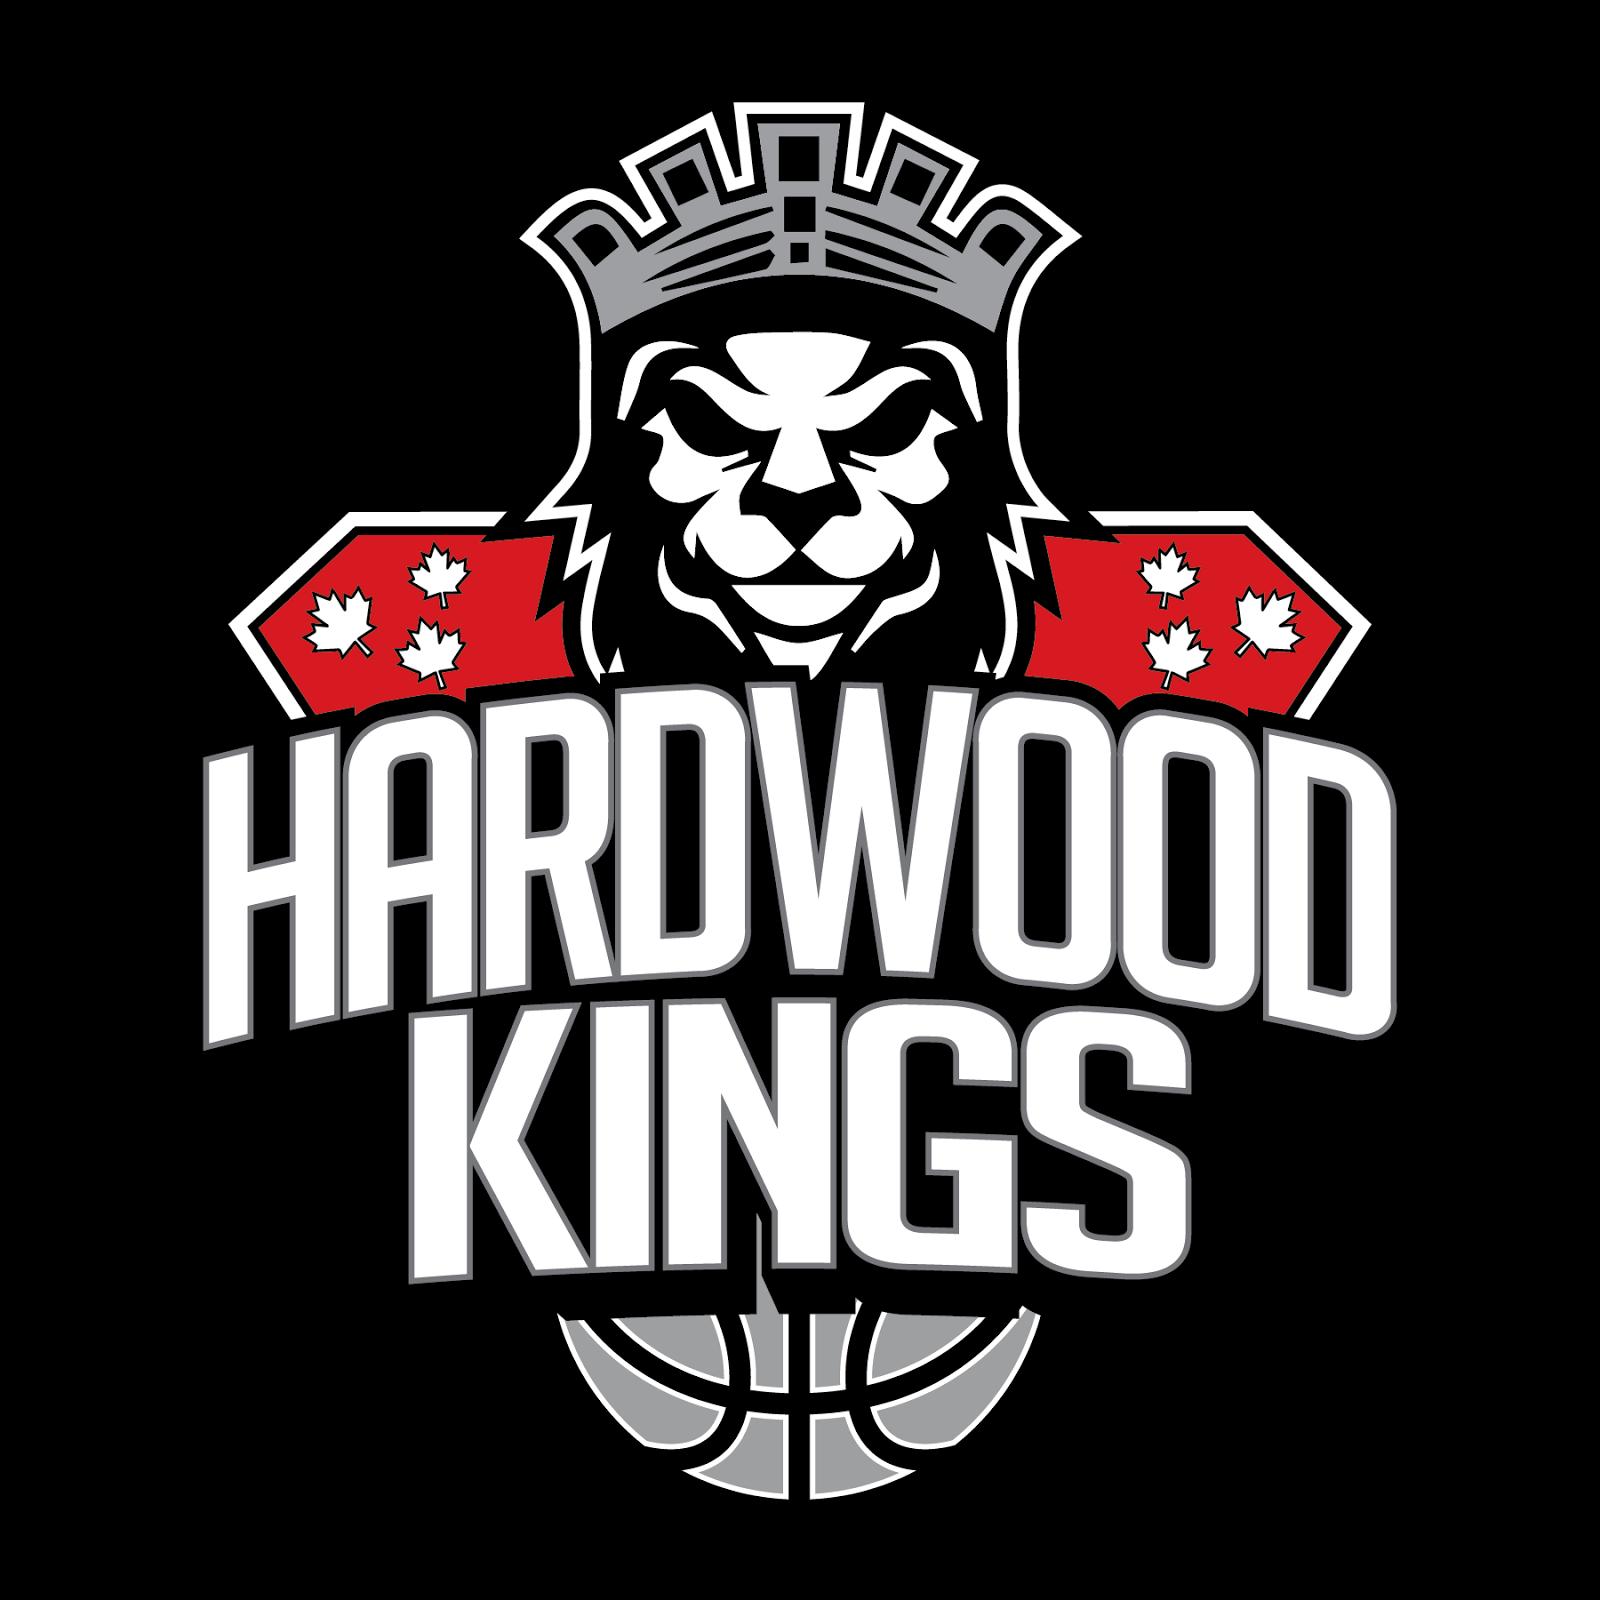 BRAMPTON HARDWOOD KINGS AAU